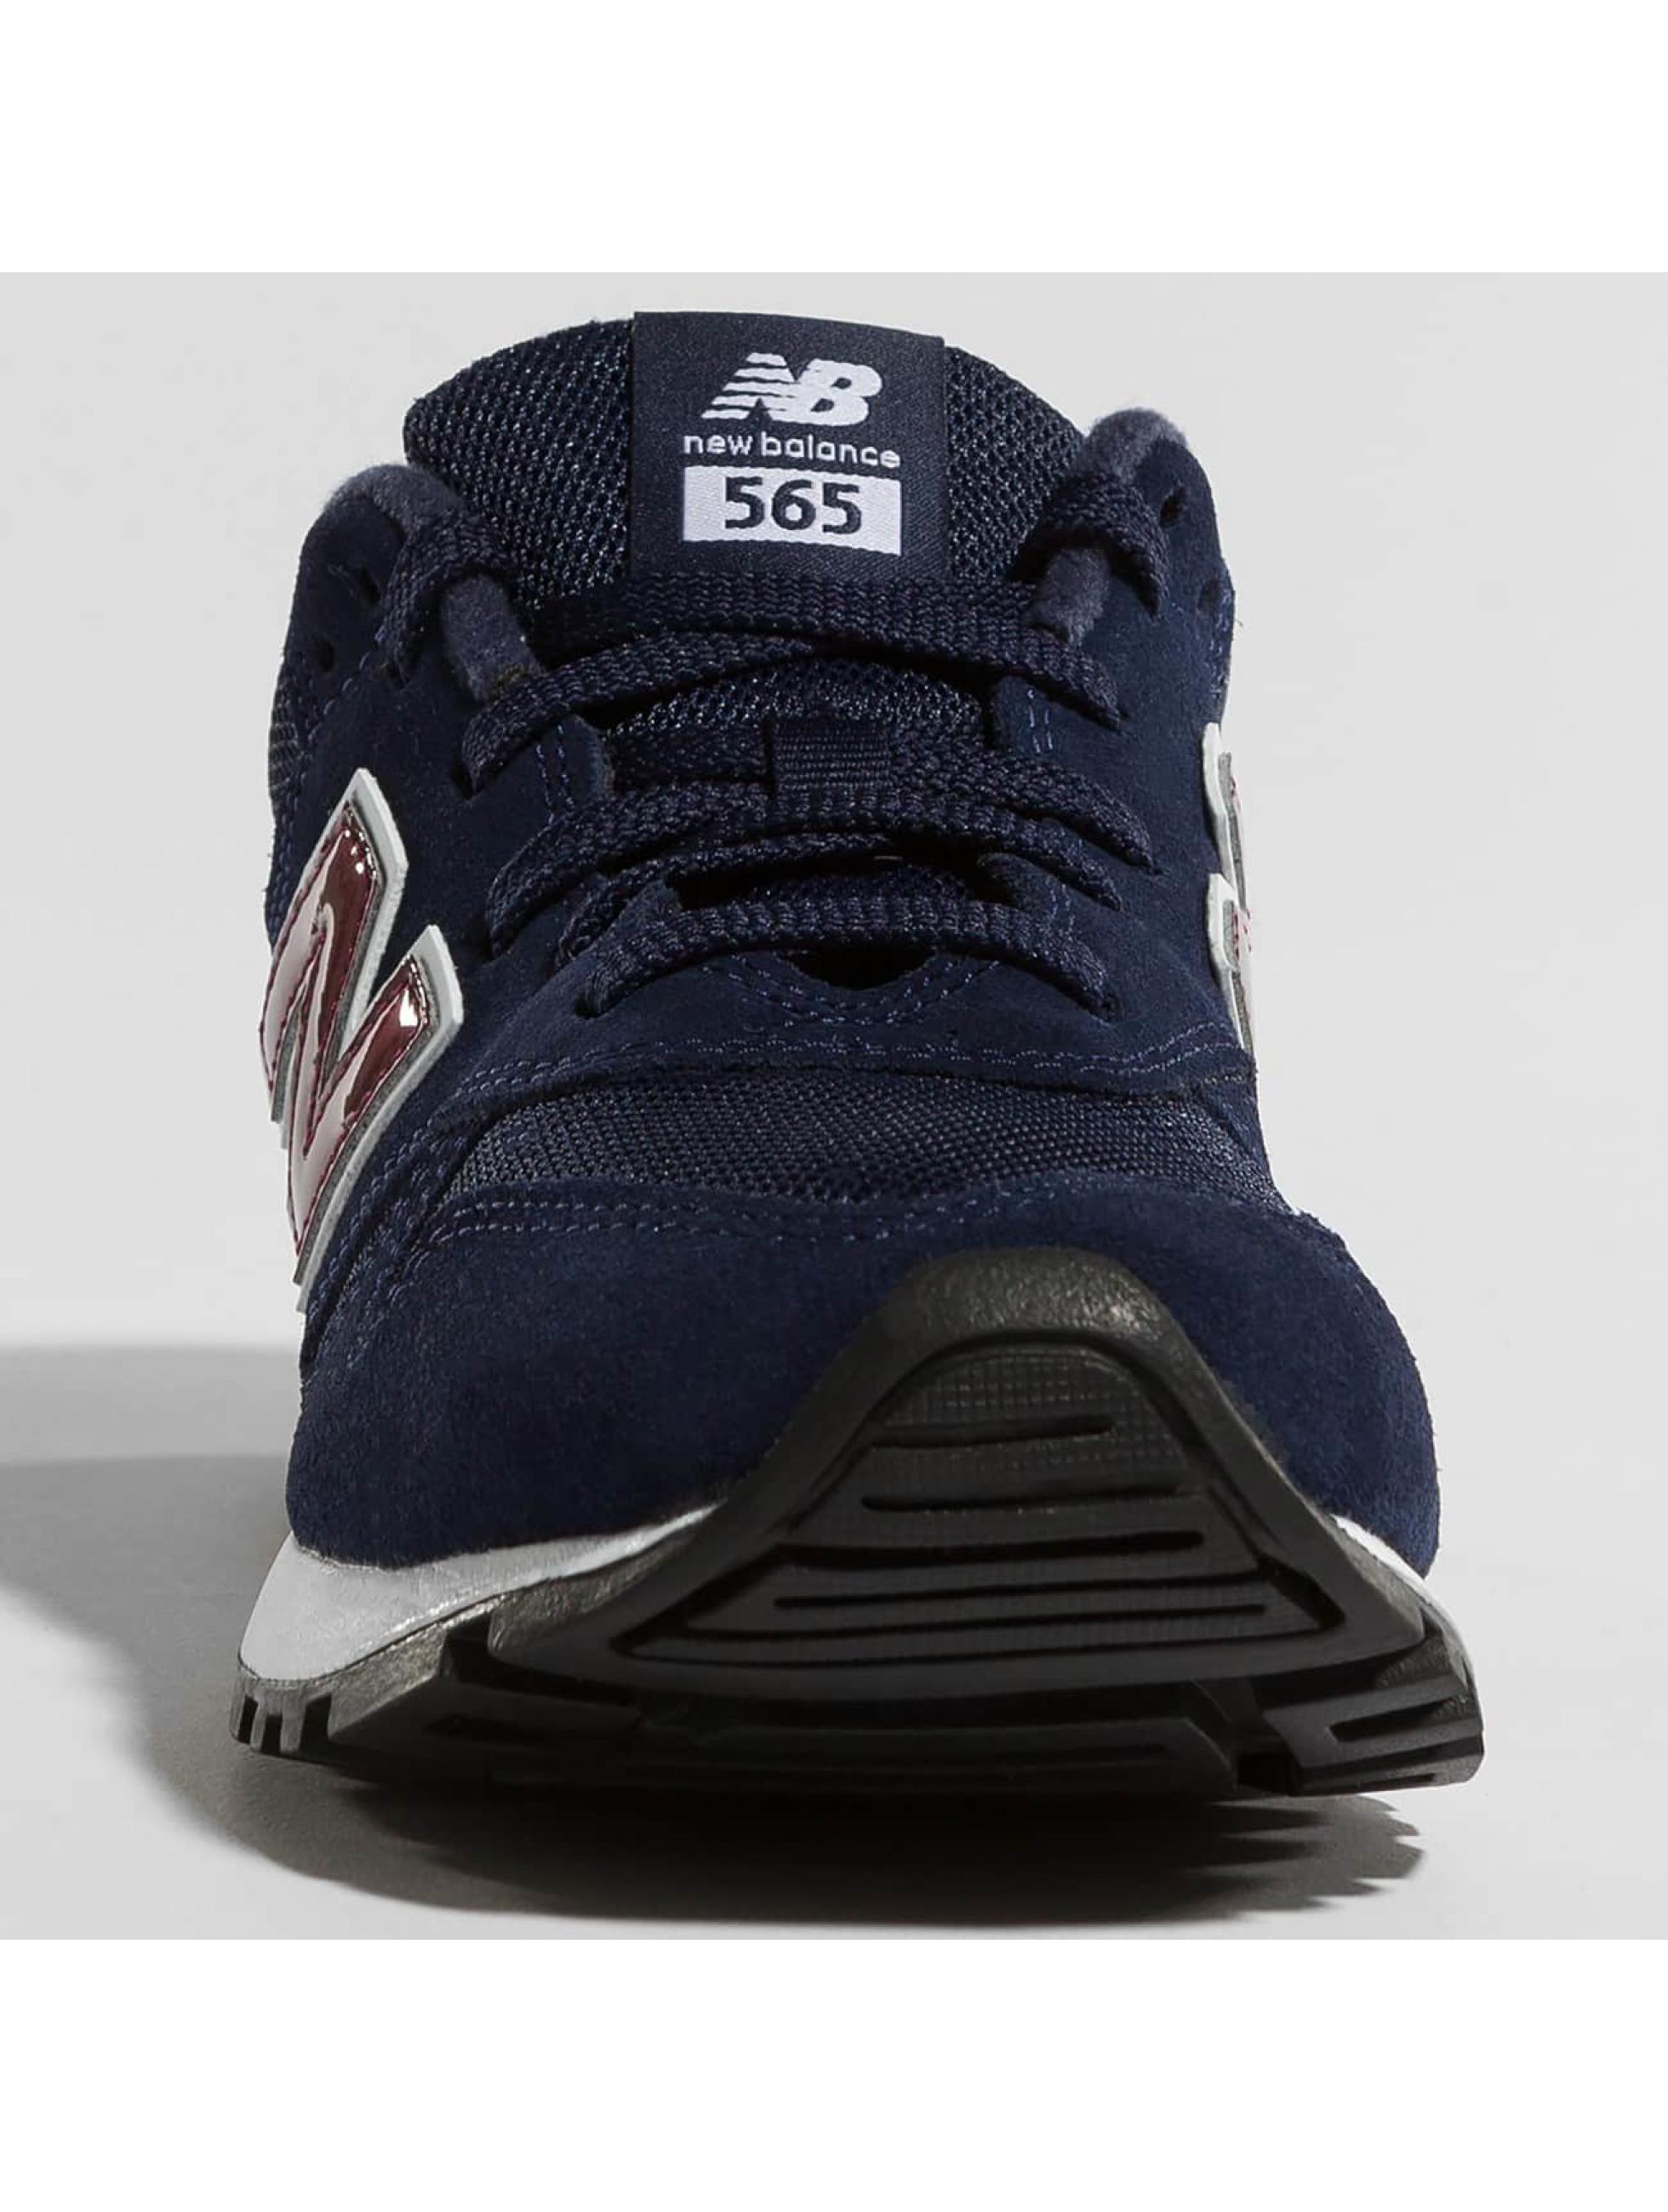 New Balance Sneakers Wl565 niebieski